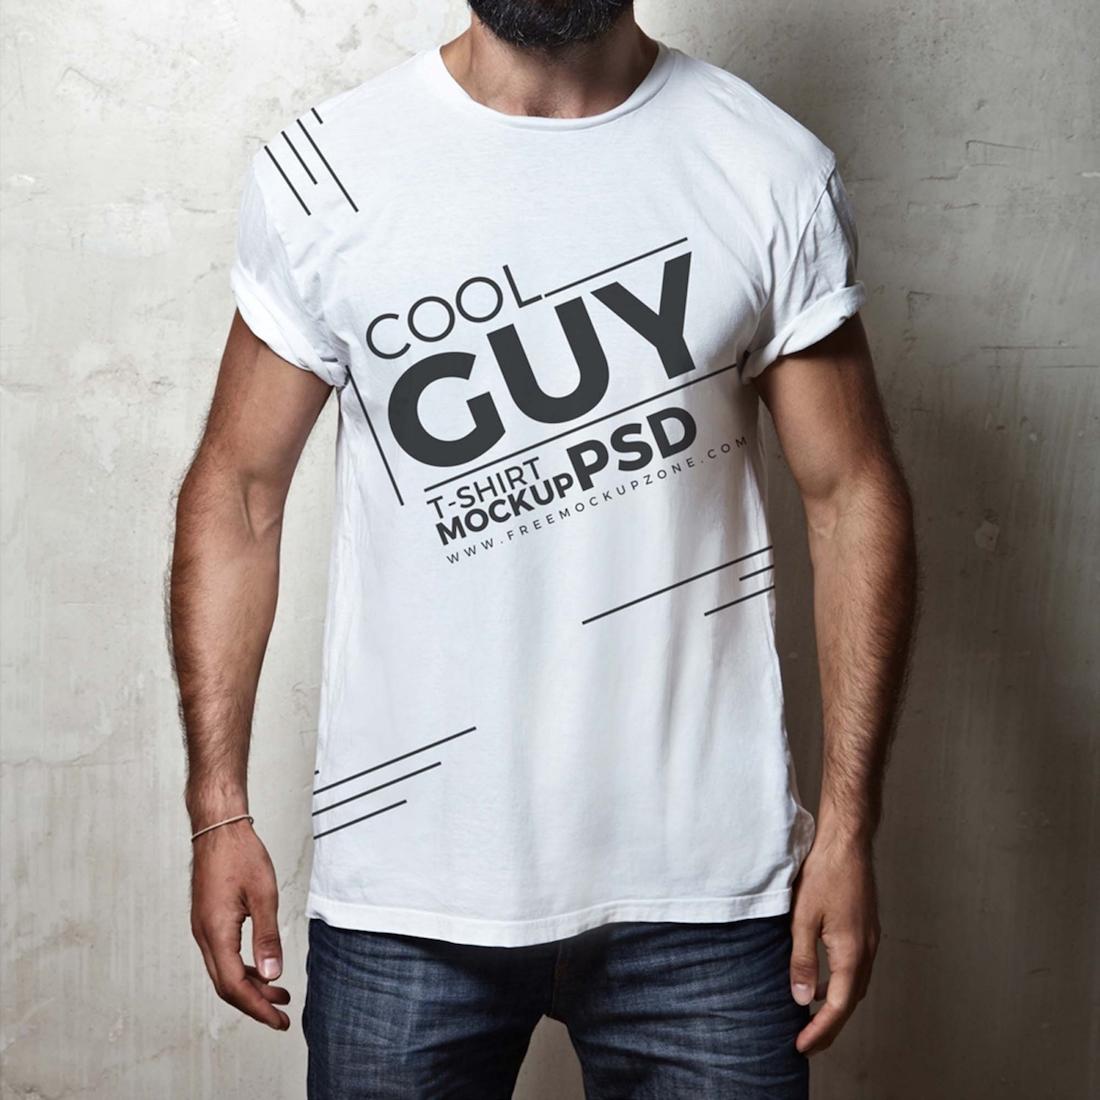 guy shirt mockup